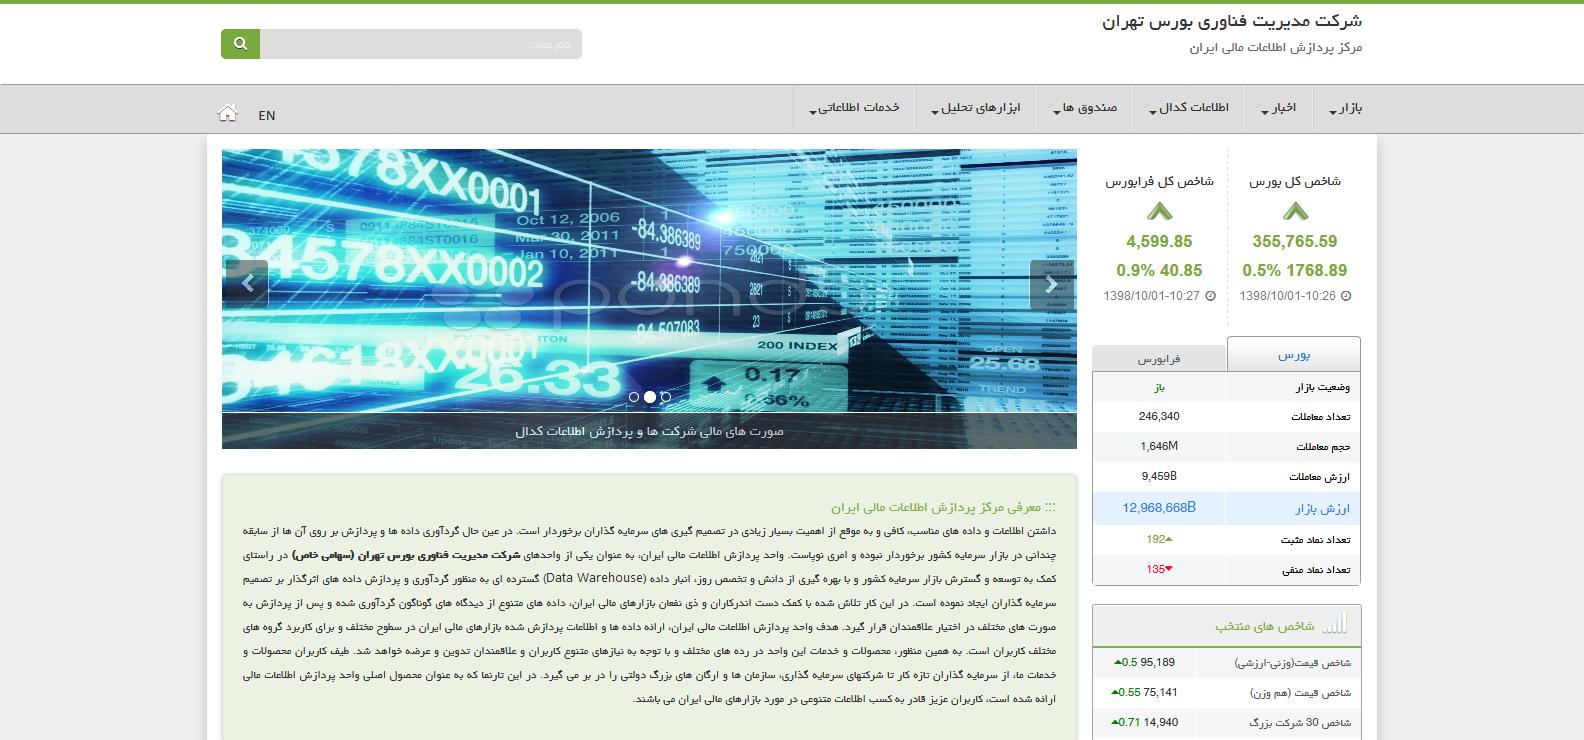 سامانه مرکز پردازش اطلاعات مالی ایران